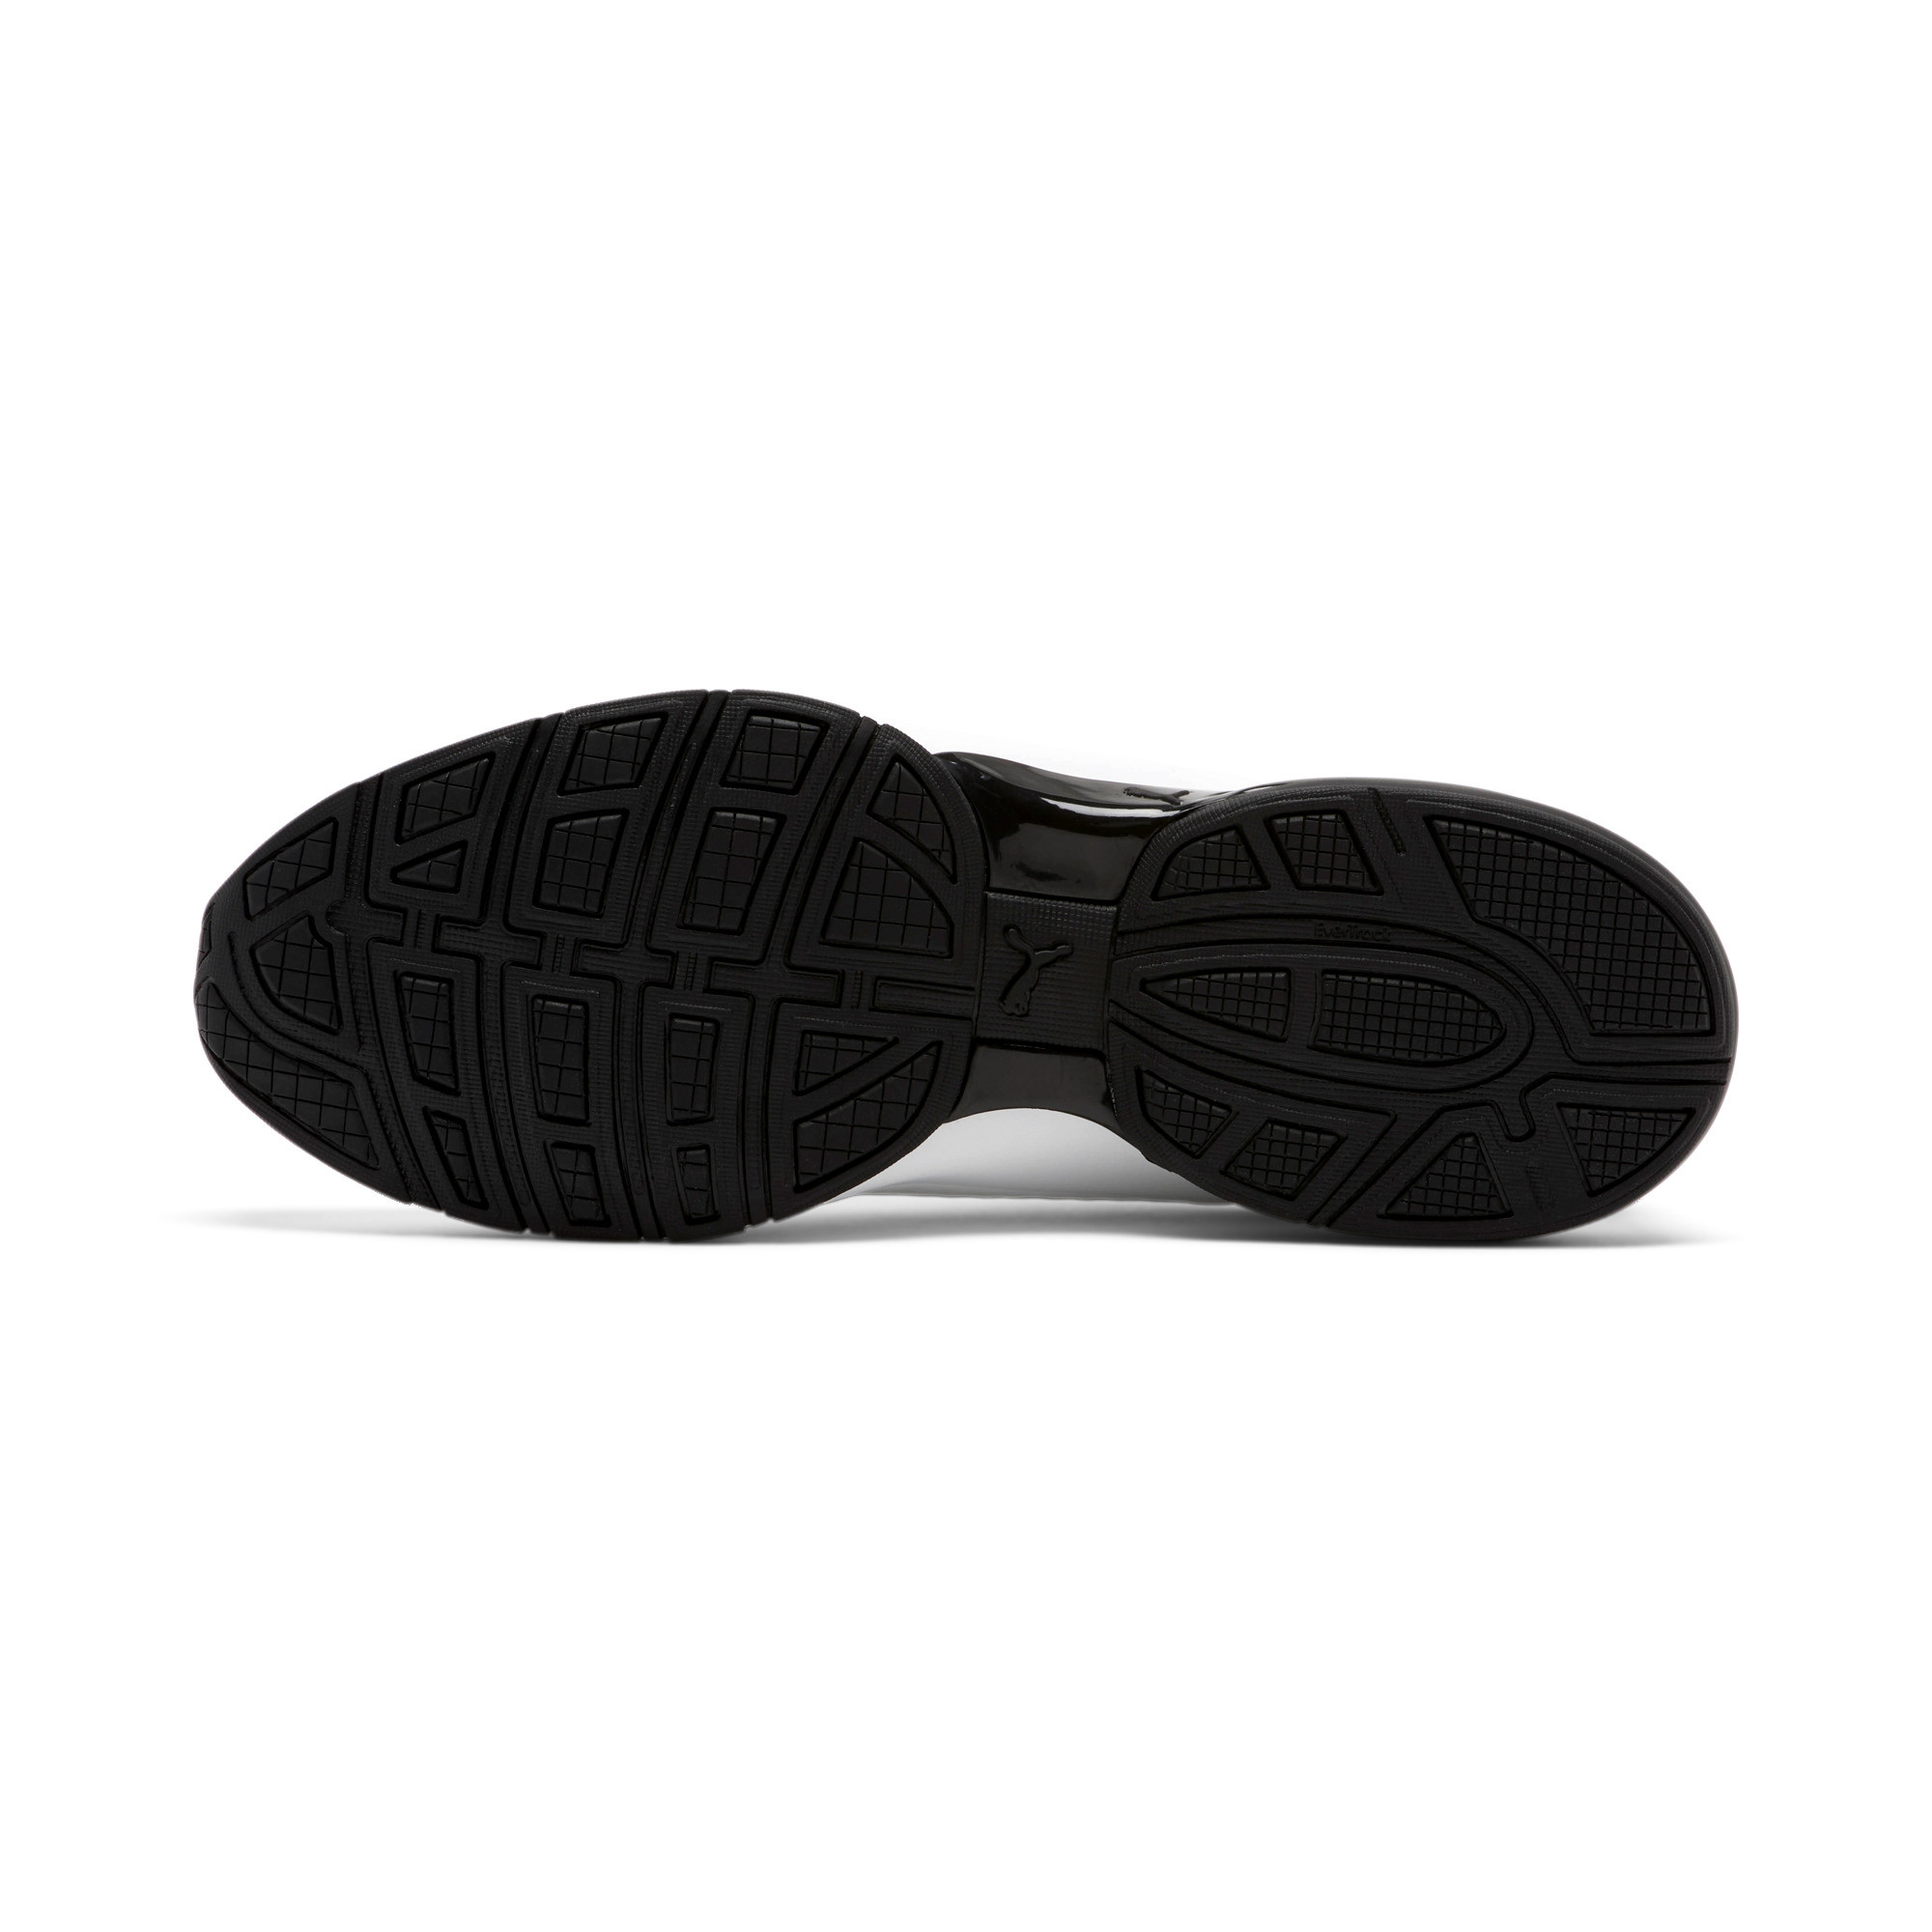 PUMA-Men-039-s-Viz-Runner-Wide-Shoes thumbnail 5